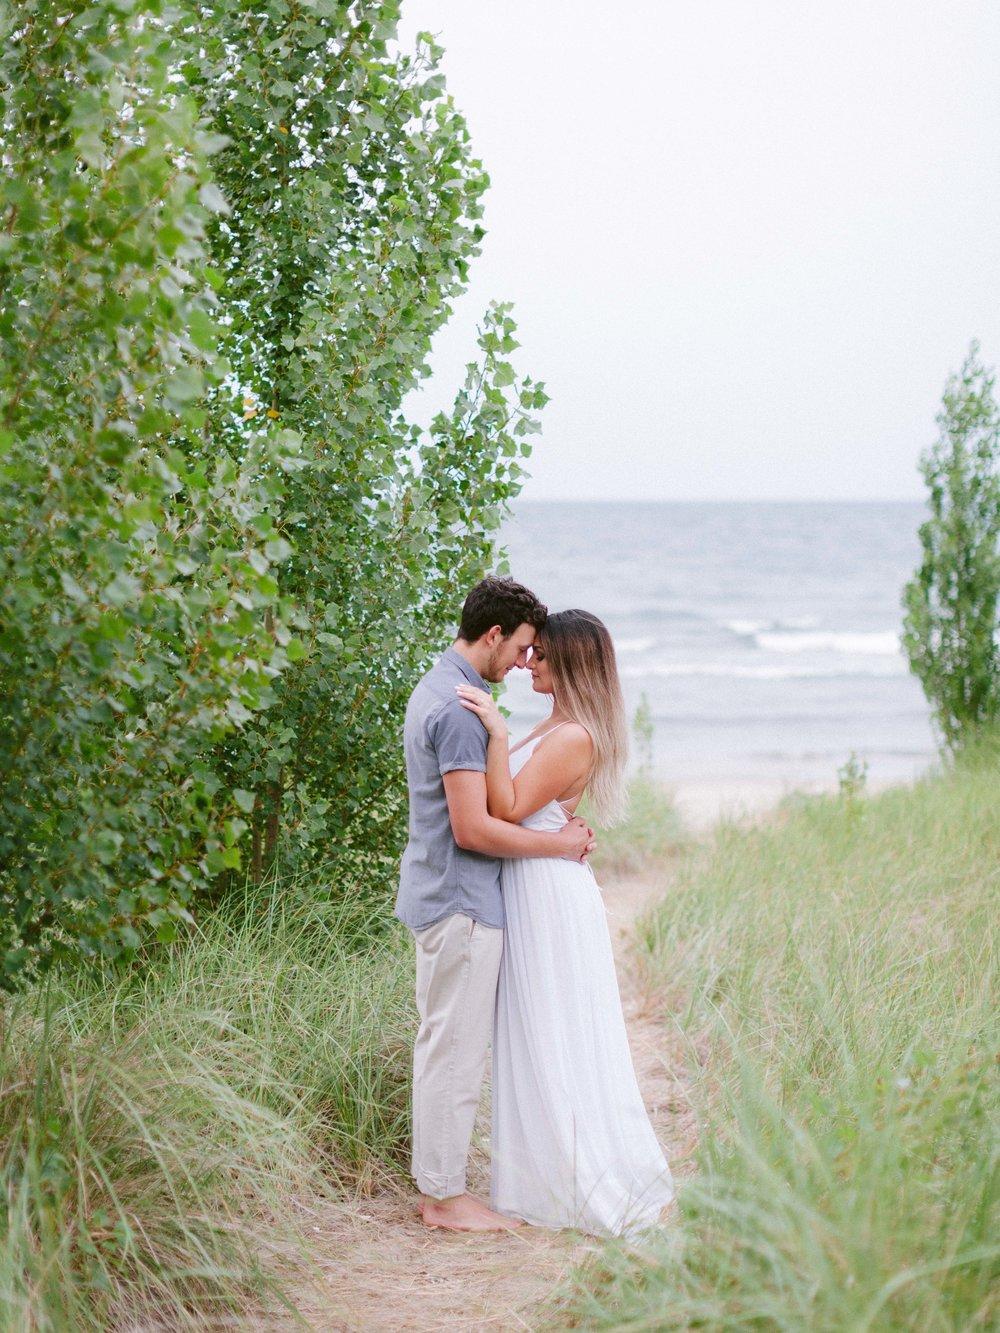 Summer_Engagament_Session_Toronto_Niagara_Wedding_Photographer (48 of 67).jpg